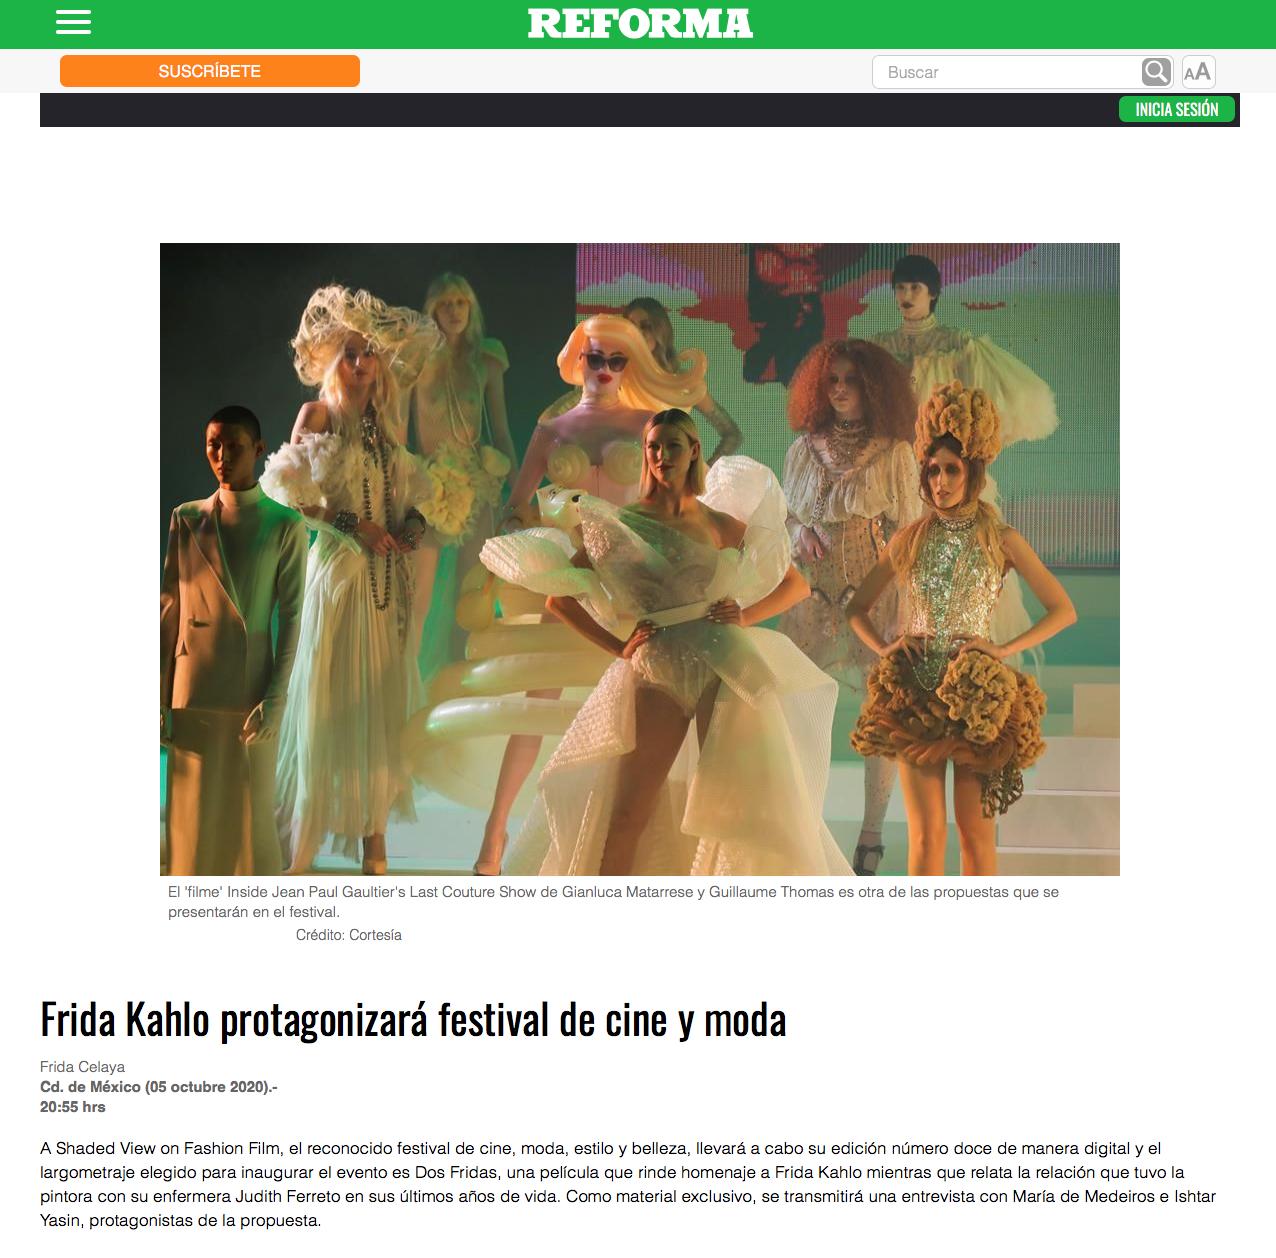 ASVOFF 12 - Reforma